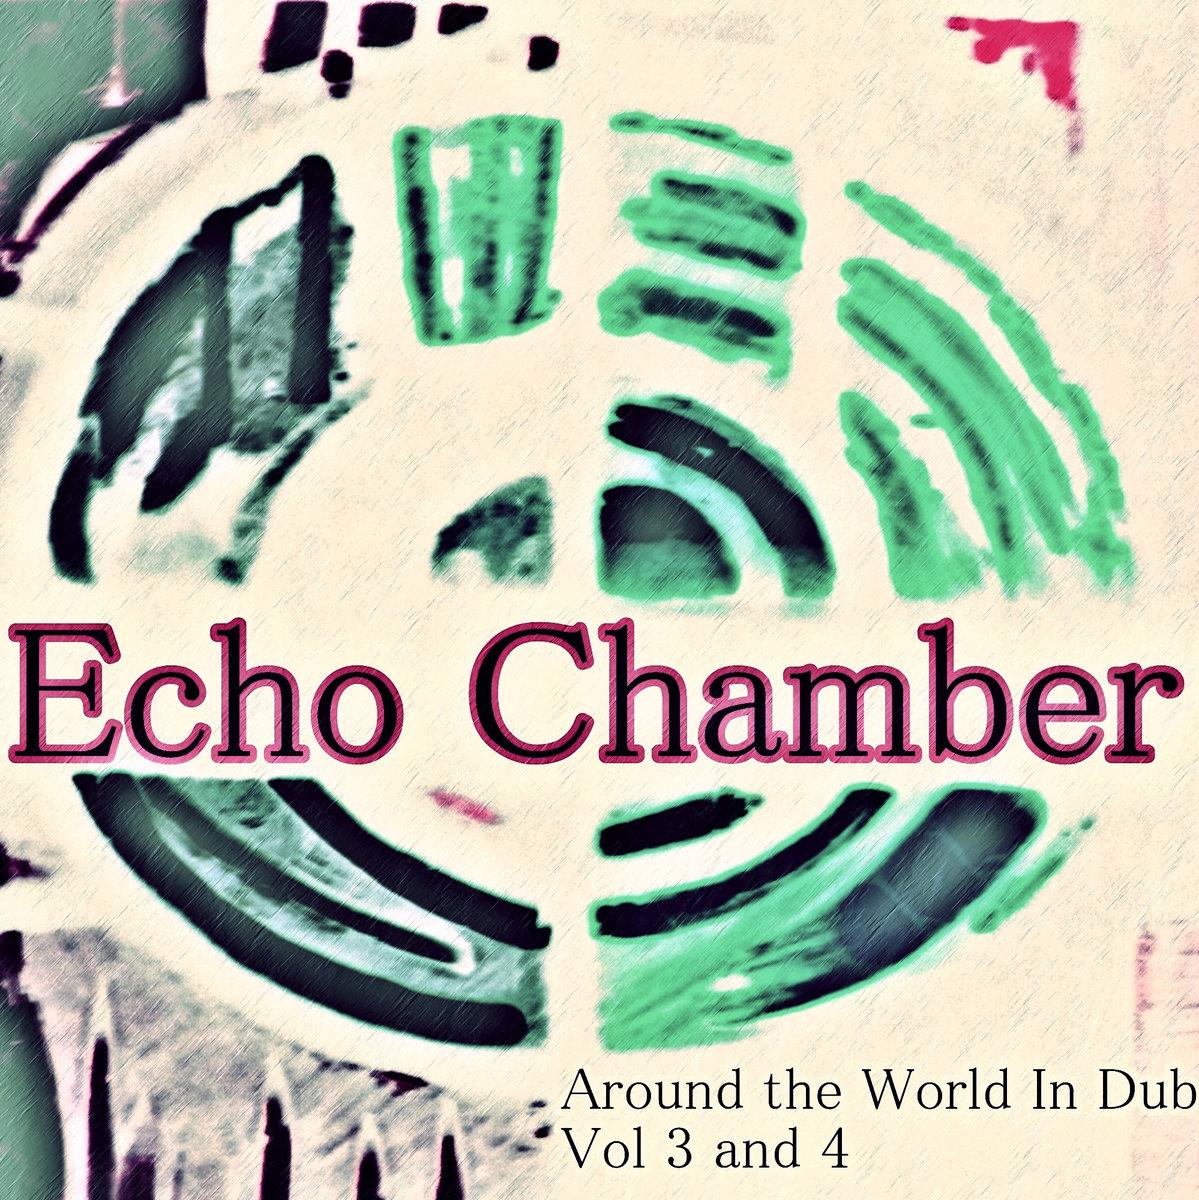 Echo Chamber - Around The World In Dub Vol 3 & 4 | Dan Dada